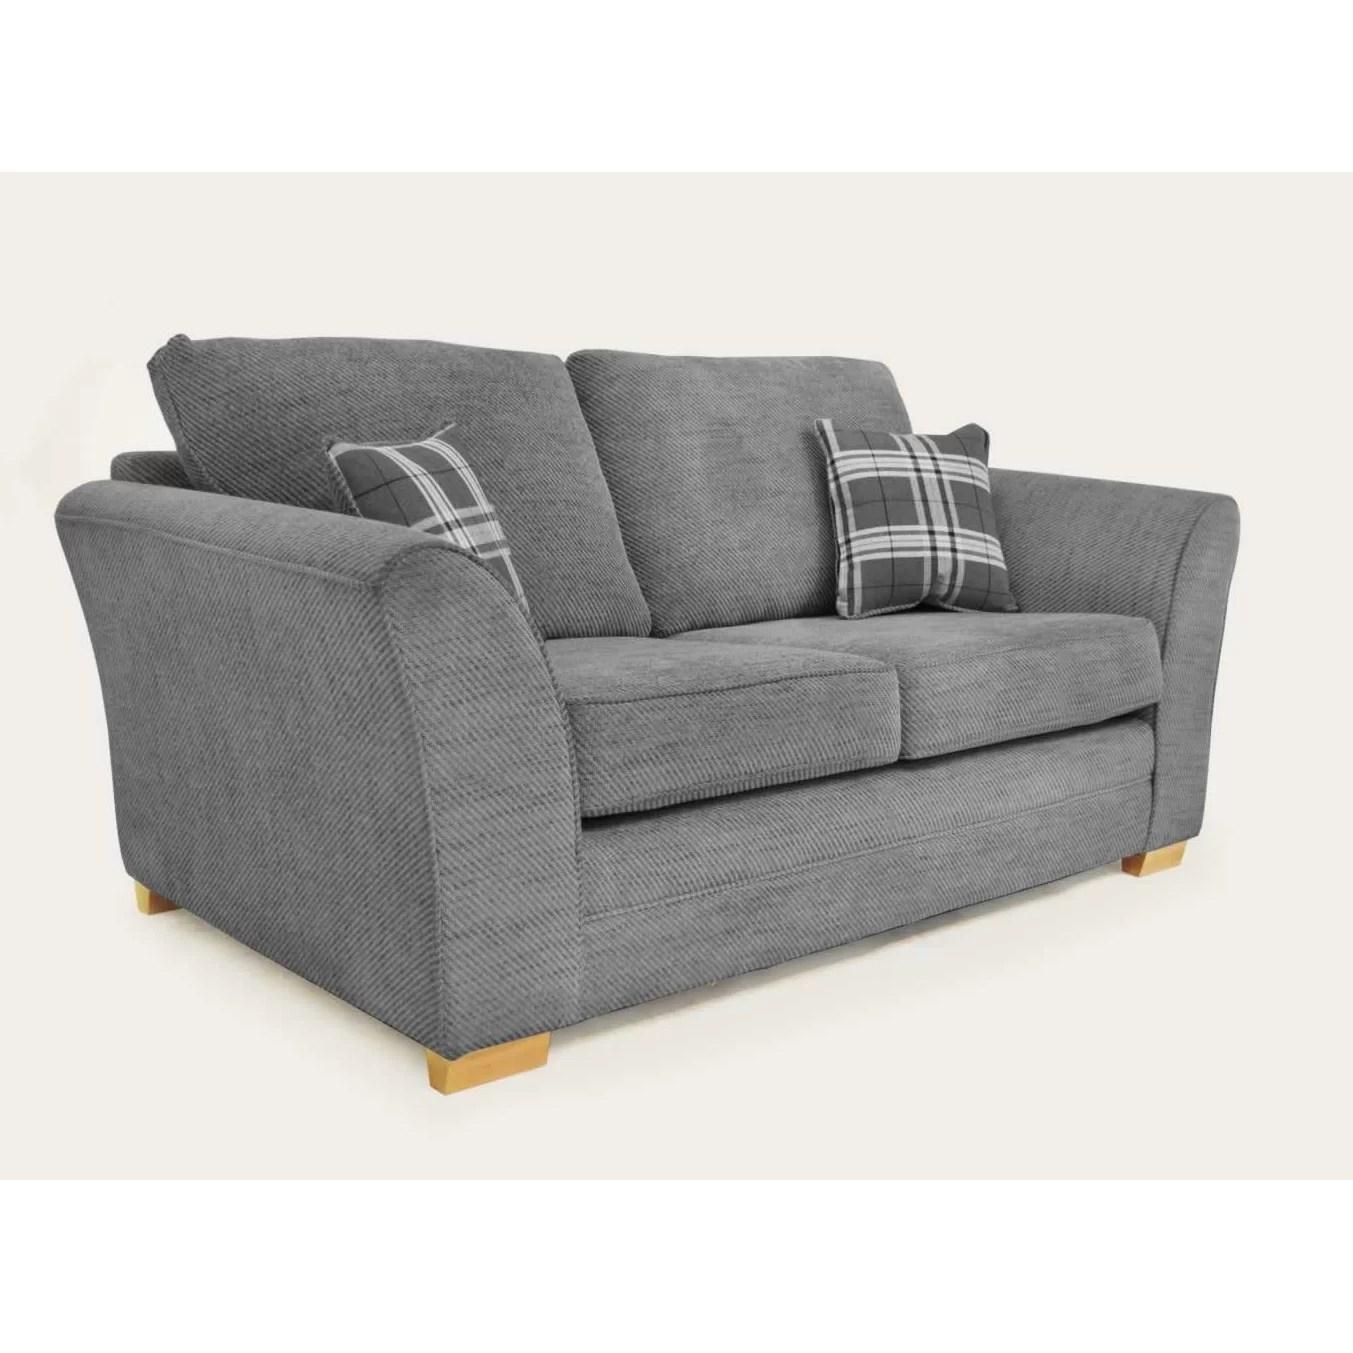 the sofa factory reviews costco furniture leather sofas warwick 2 5 seater wayfair uk